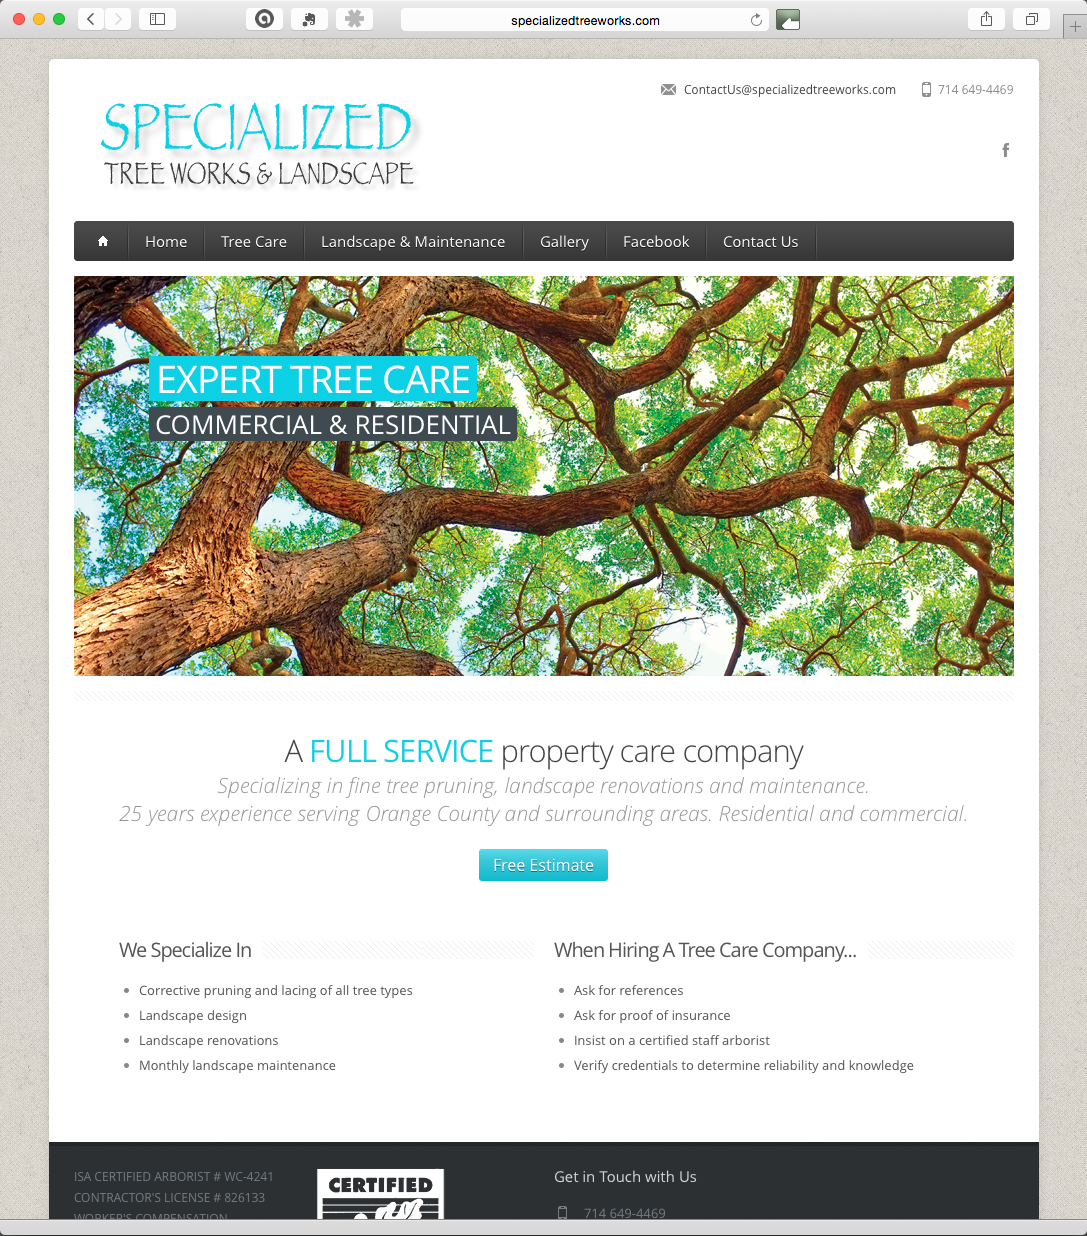 Website Design & Development – Specialized Tree Works